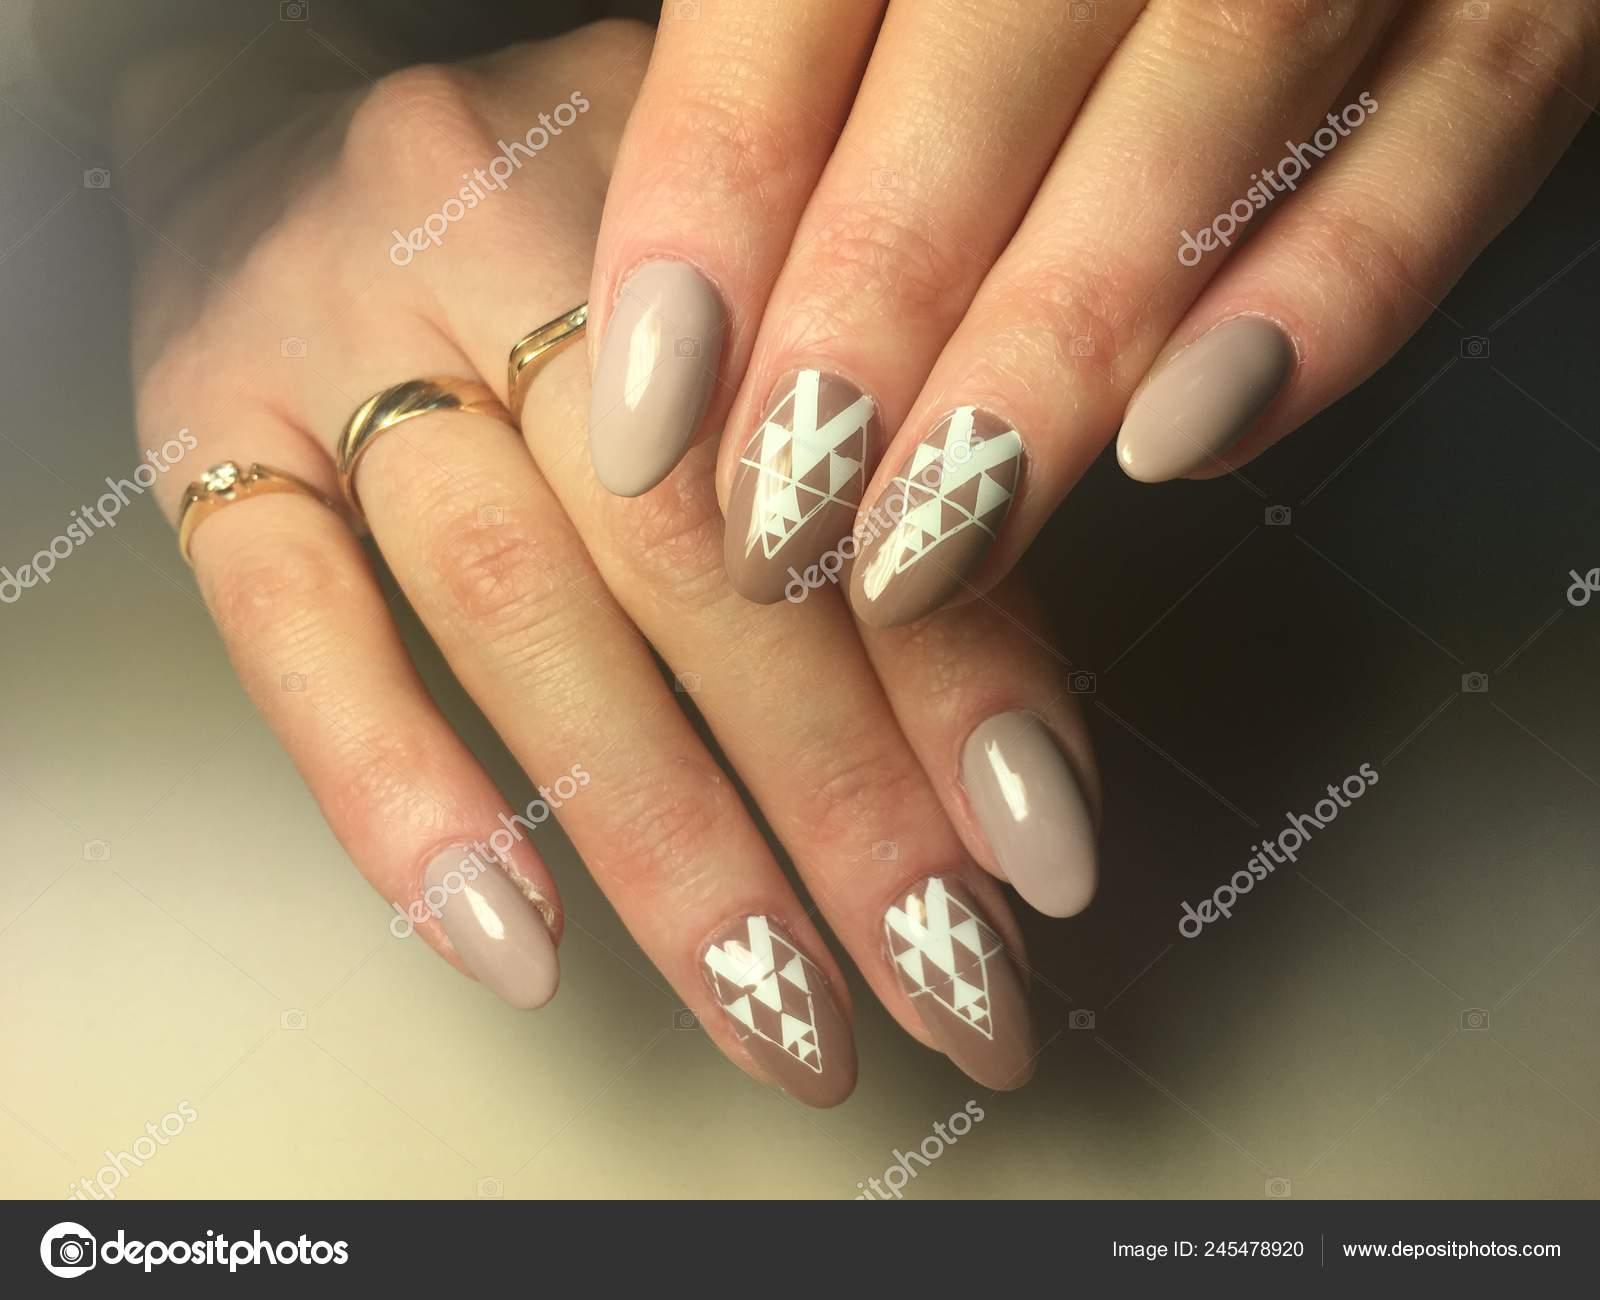 Fashionable Beige Manicure Bright White Design Long Nails